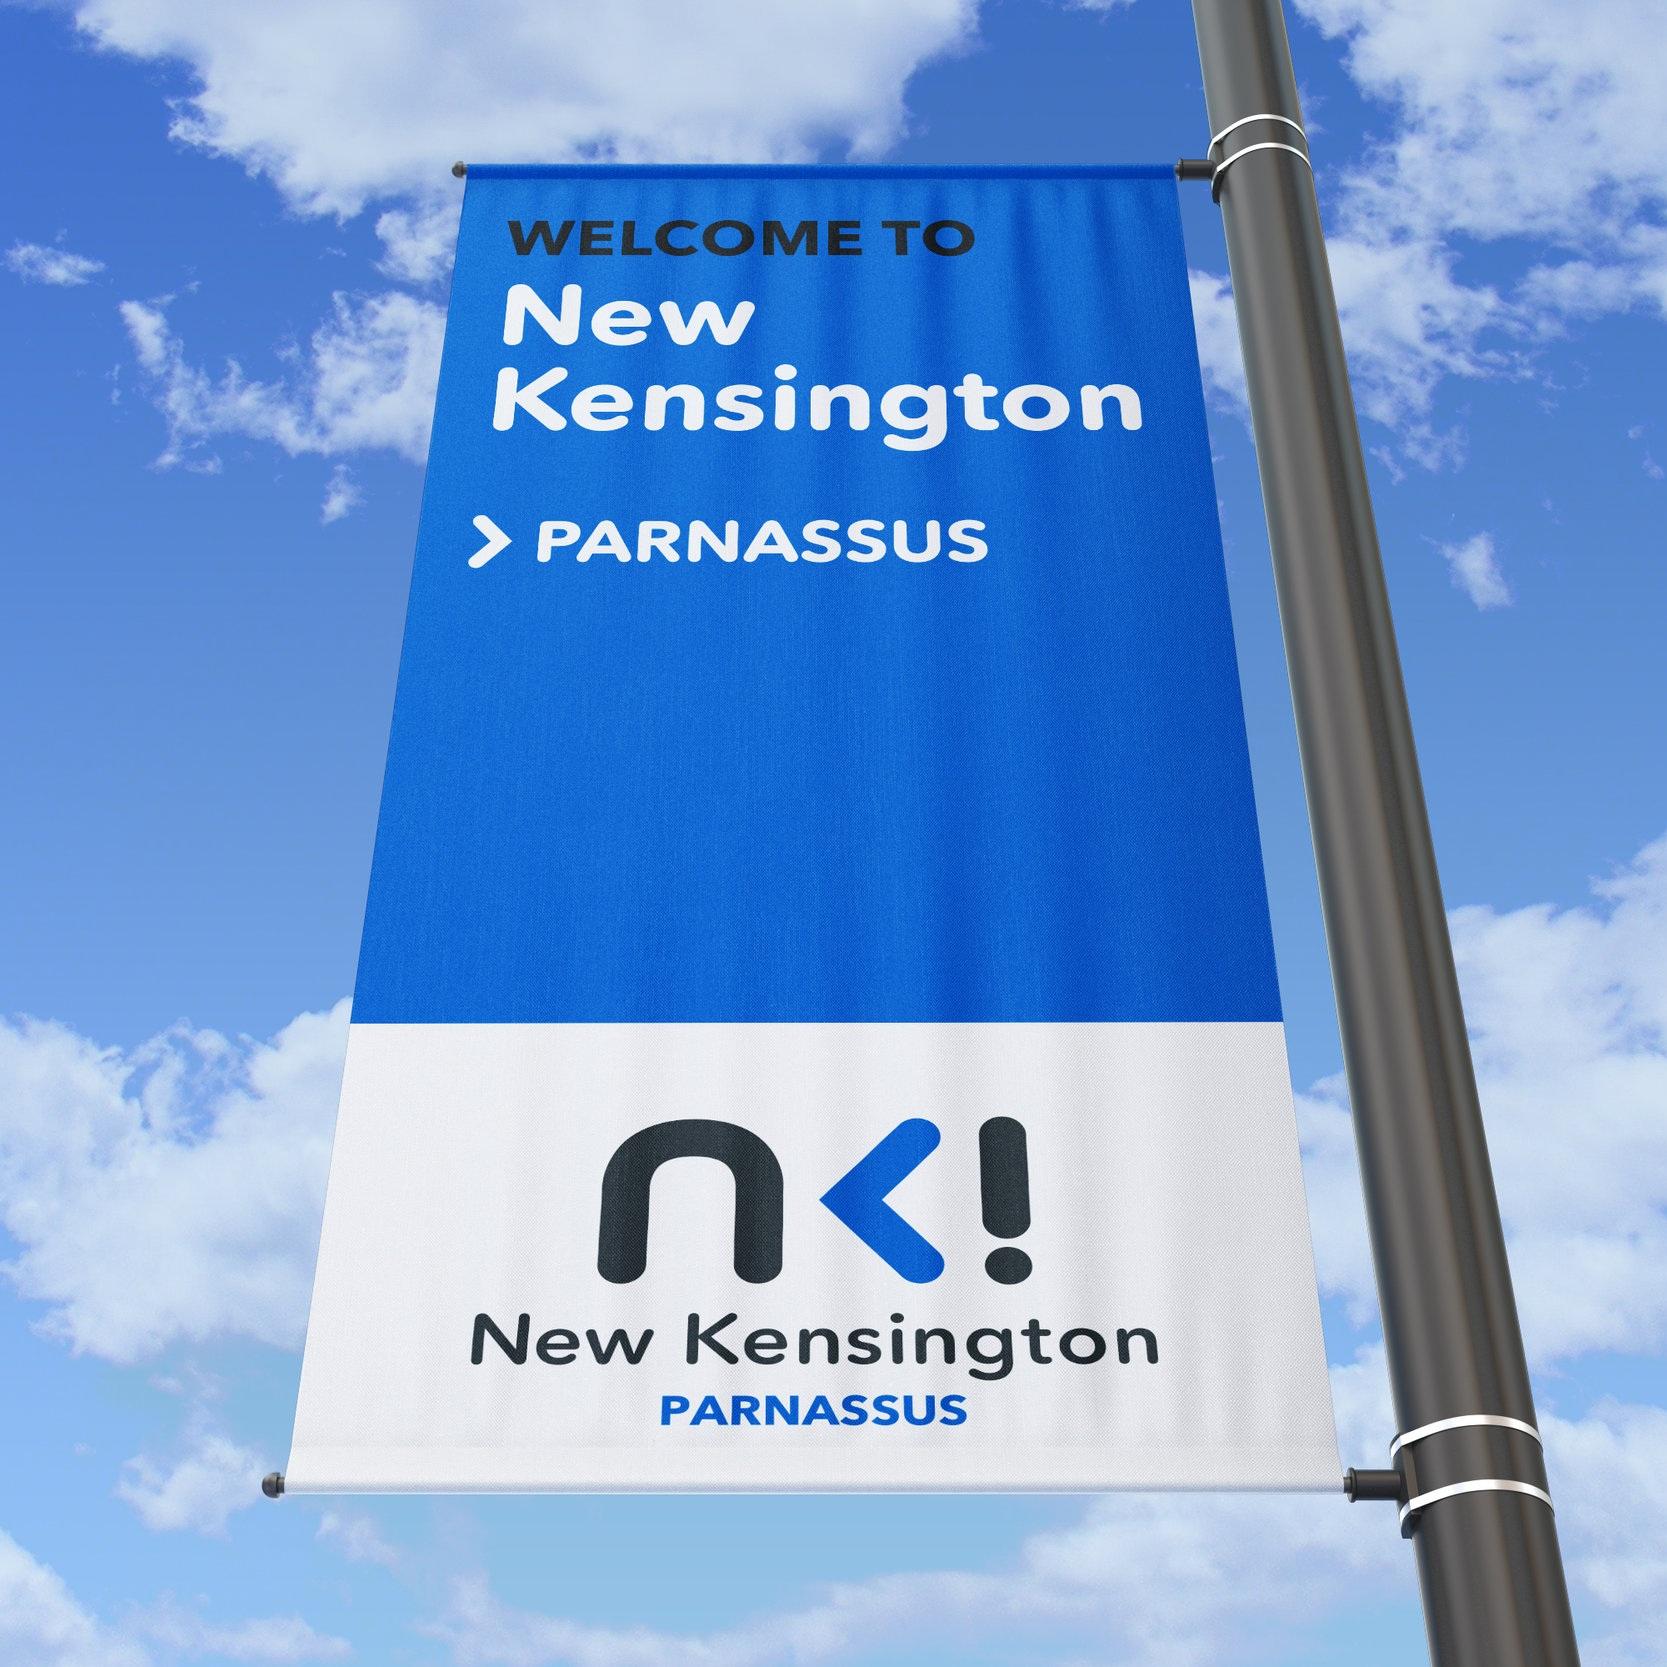 NewKen_Welcome_Poster_Concept1_Parnassus.jpg